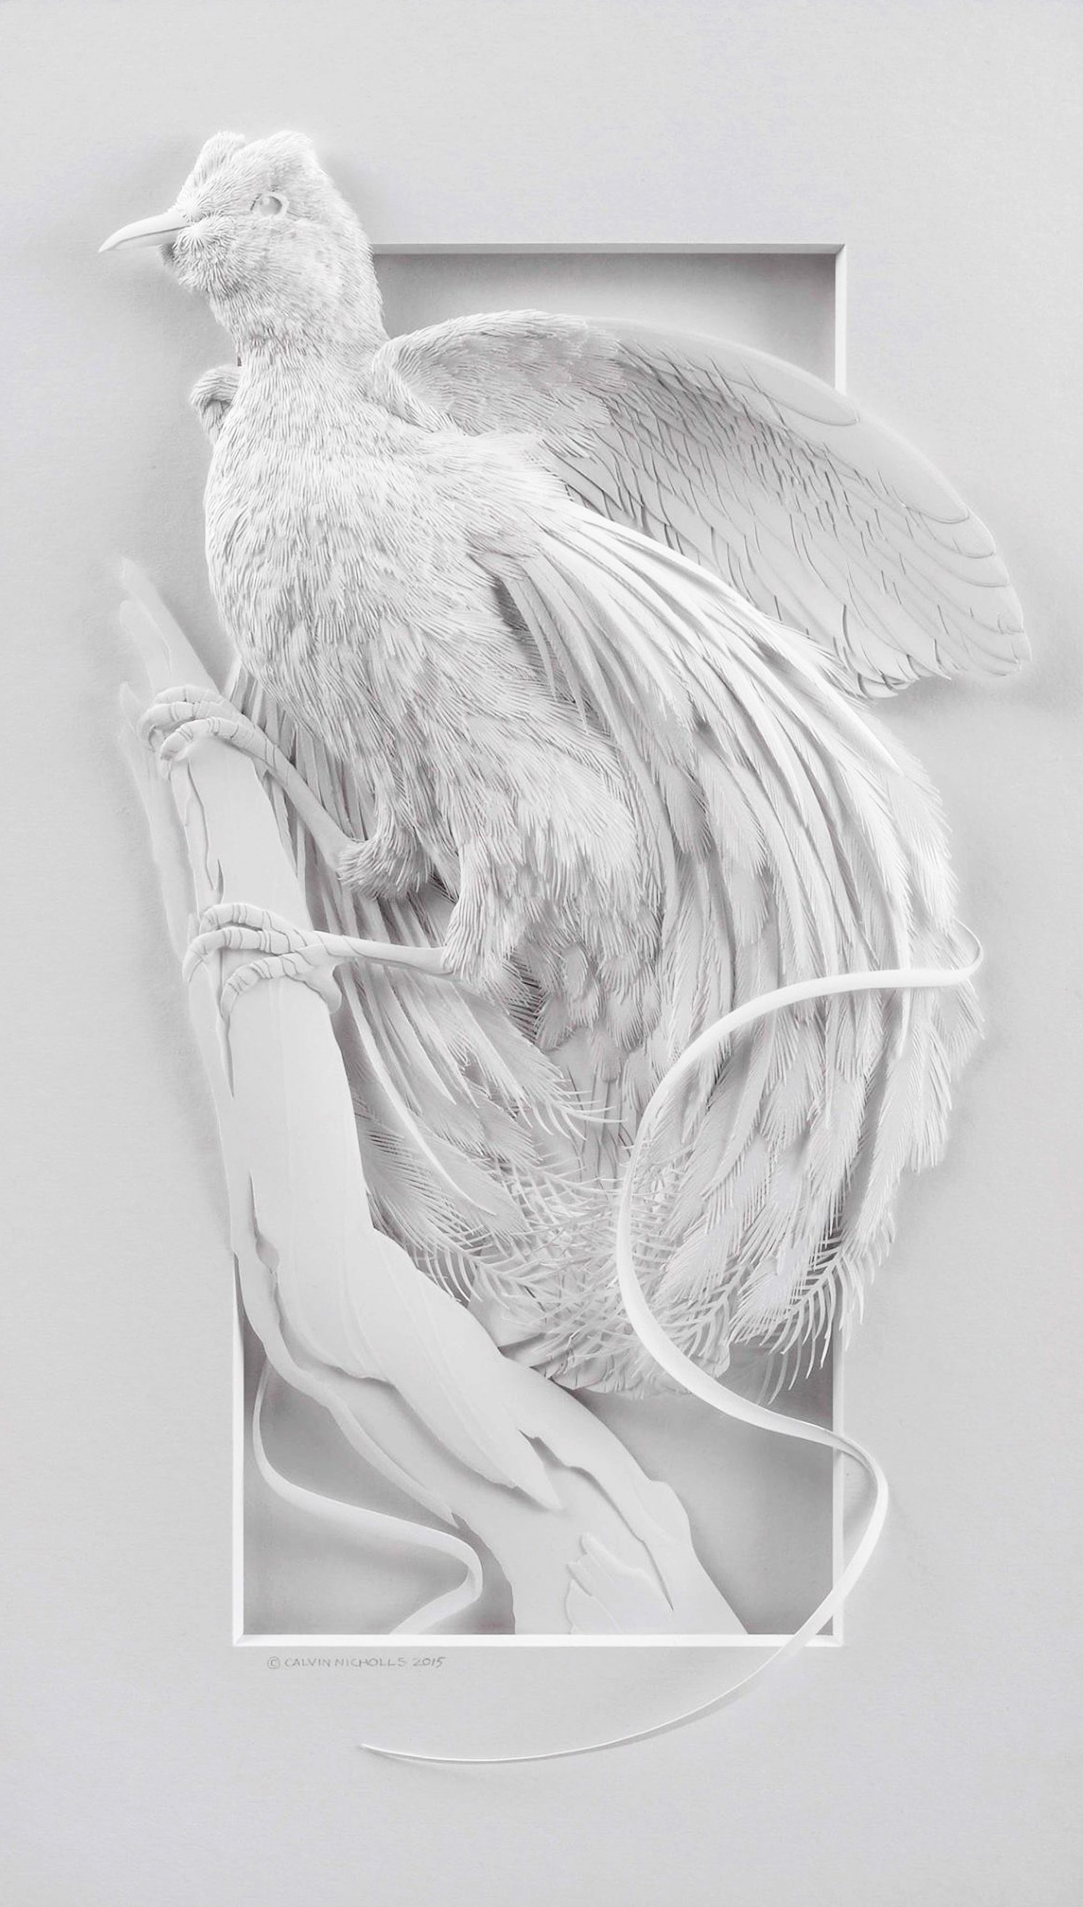 Calvin Nicholls Paper Art 3